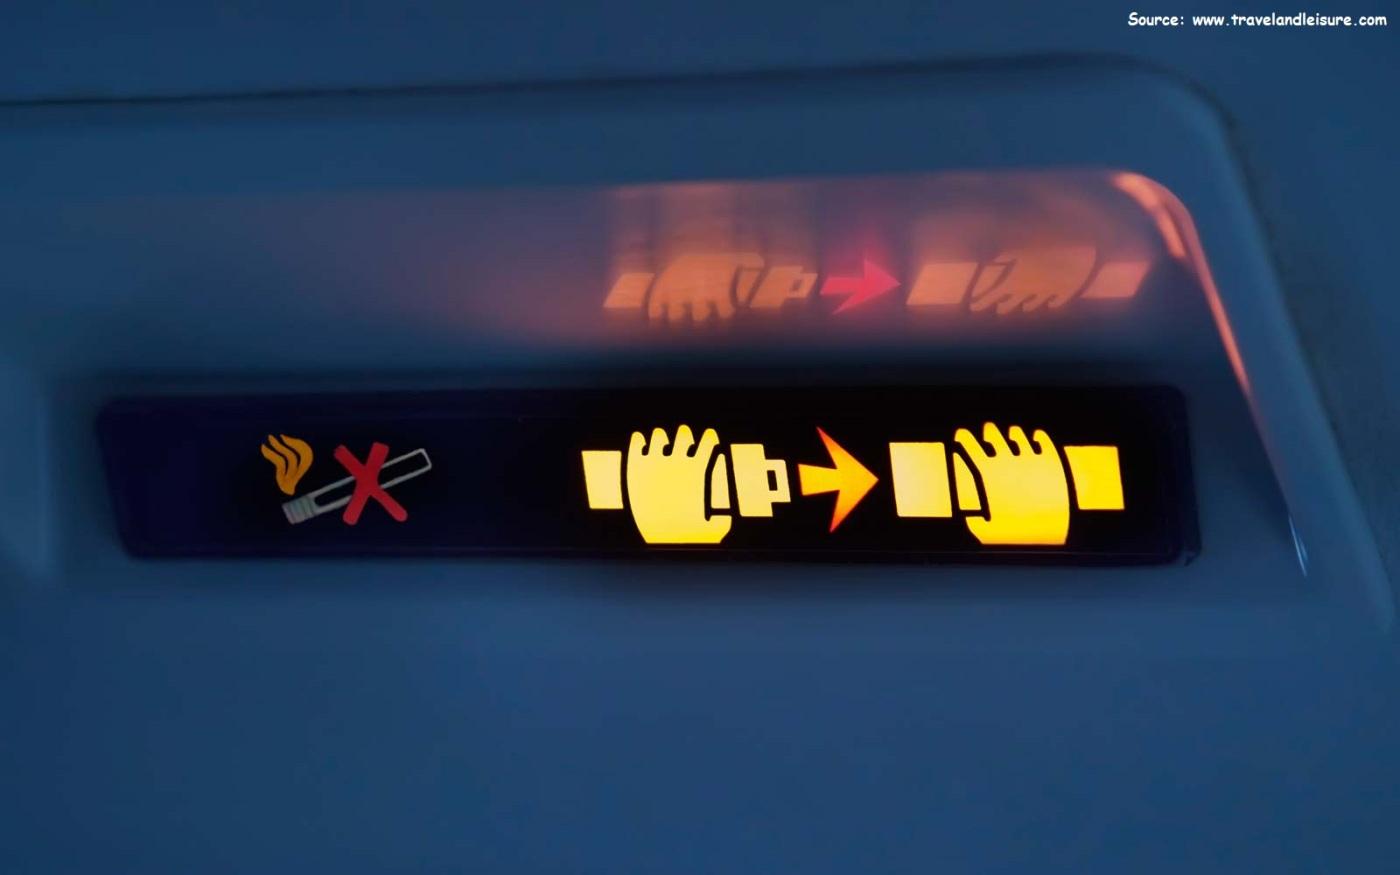 safe to remove seatbelt